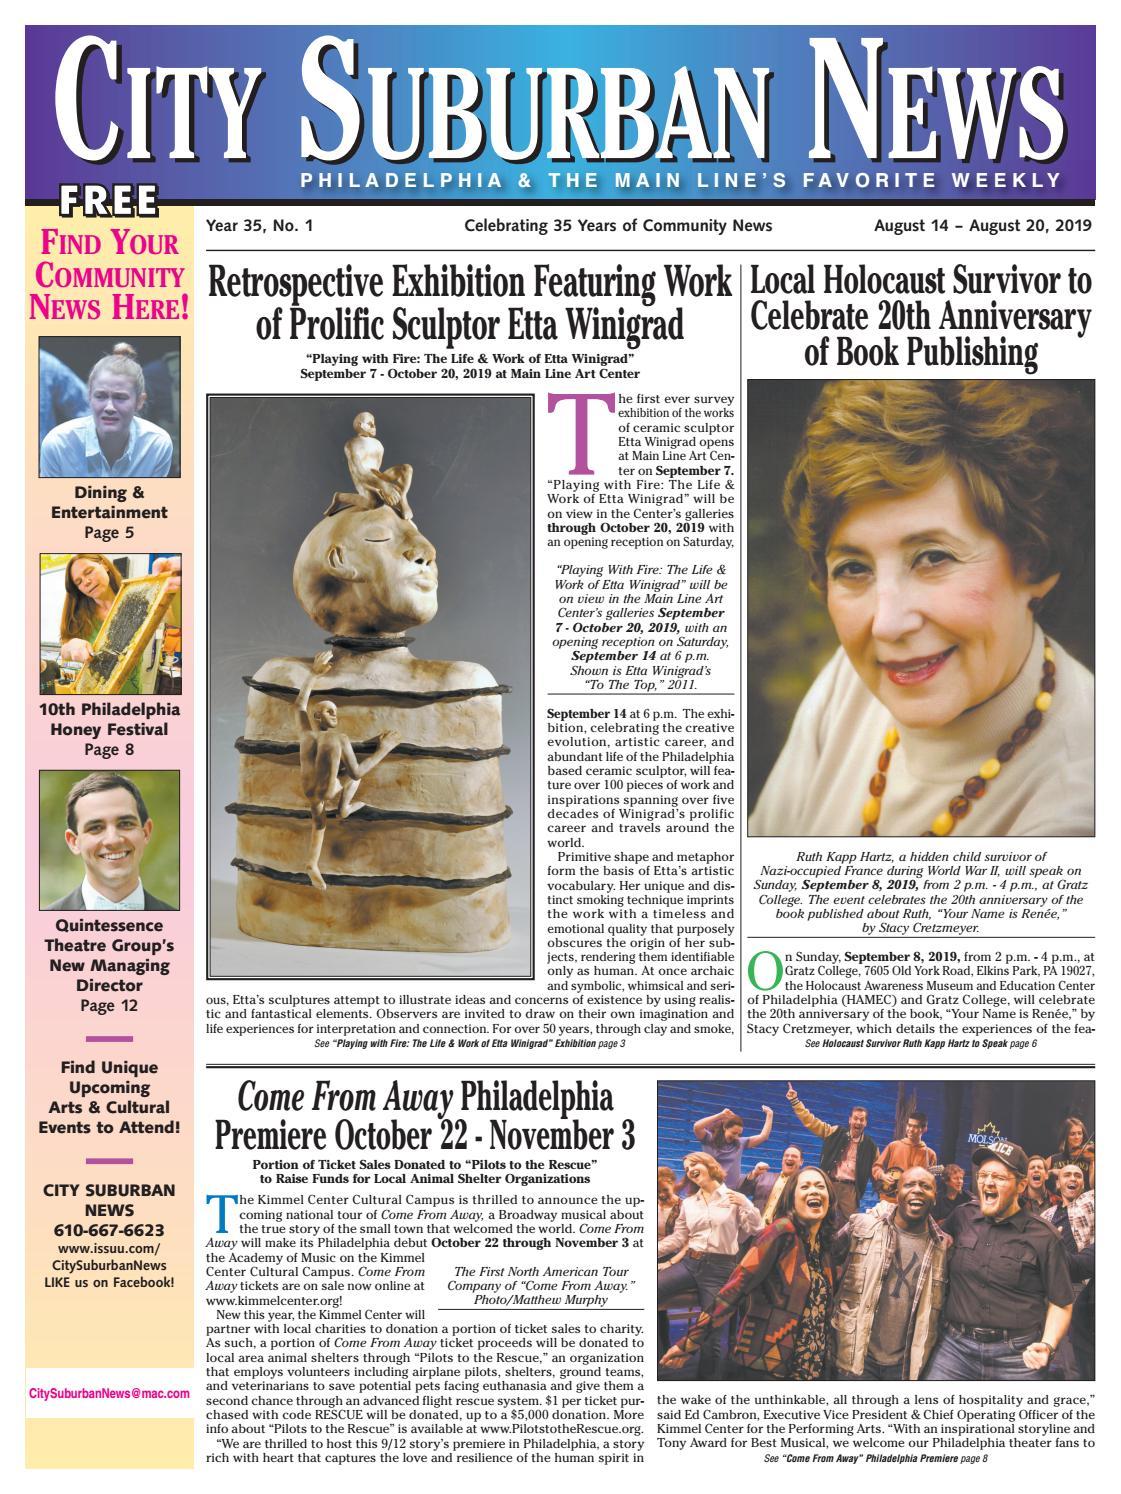 City Suburban News 8 14 19 Issue By City Suburban News Issuu